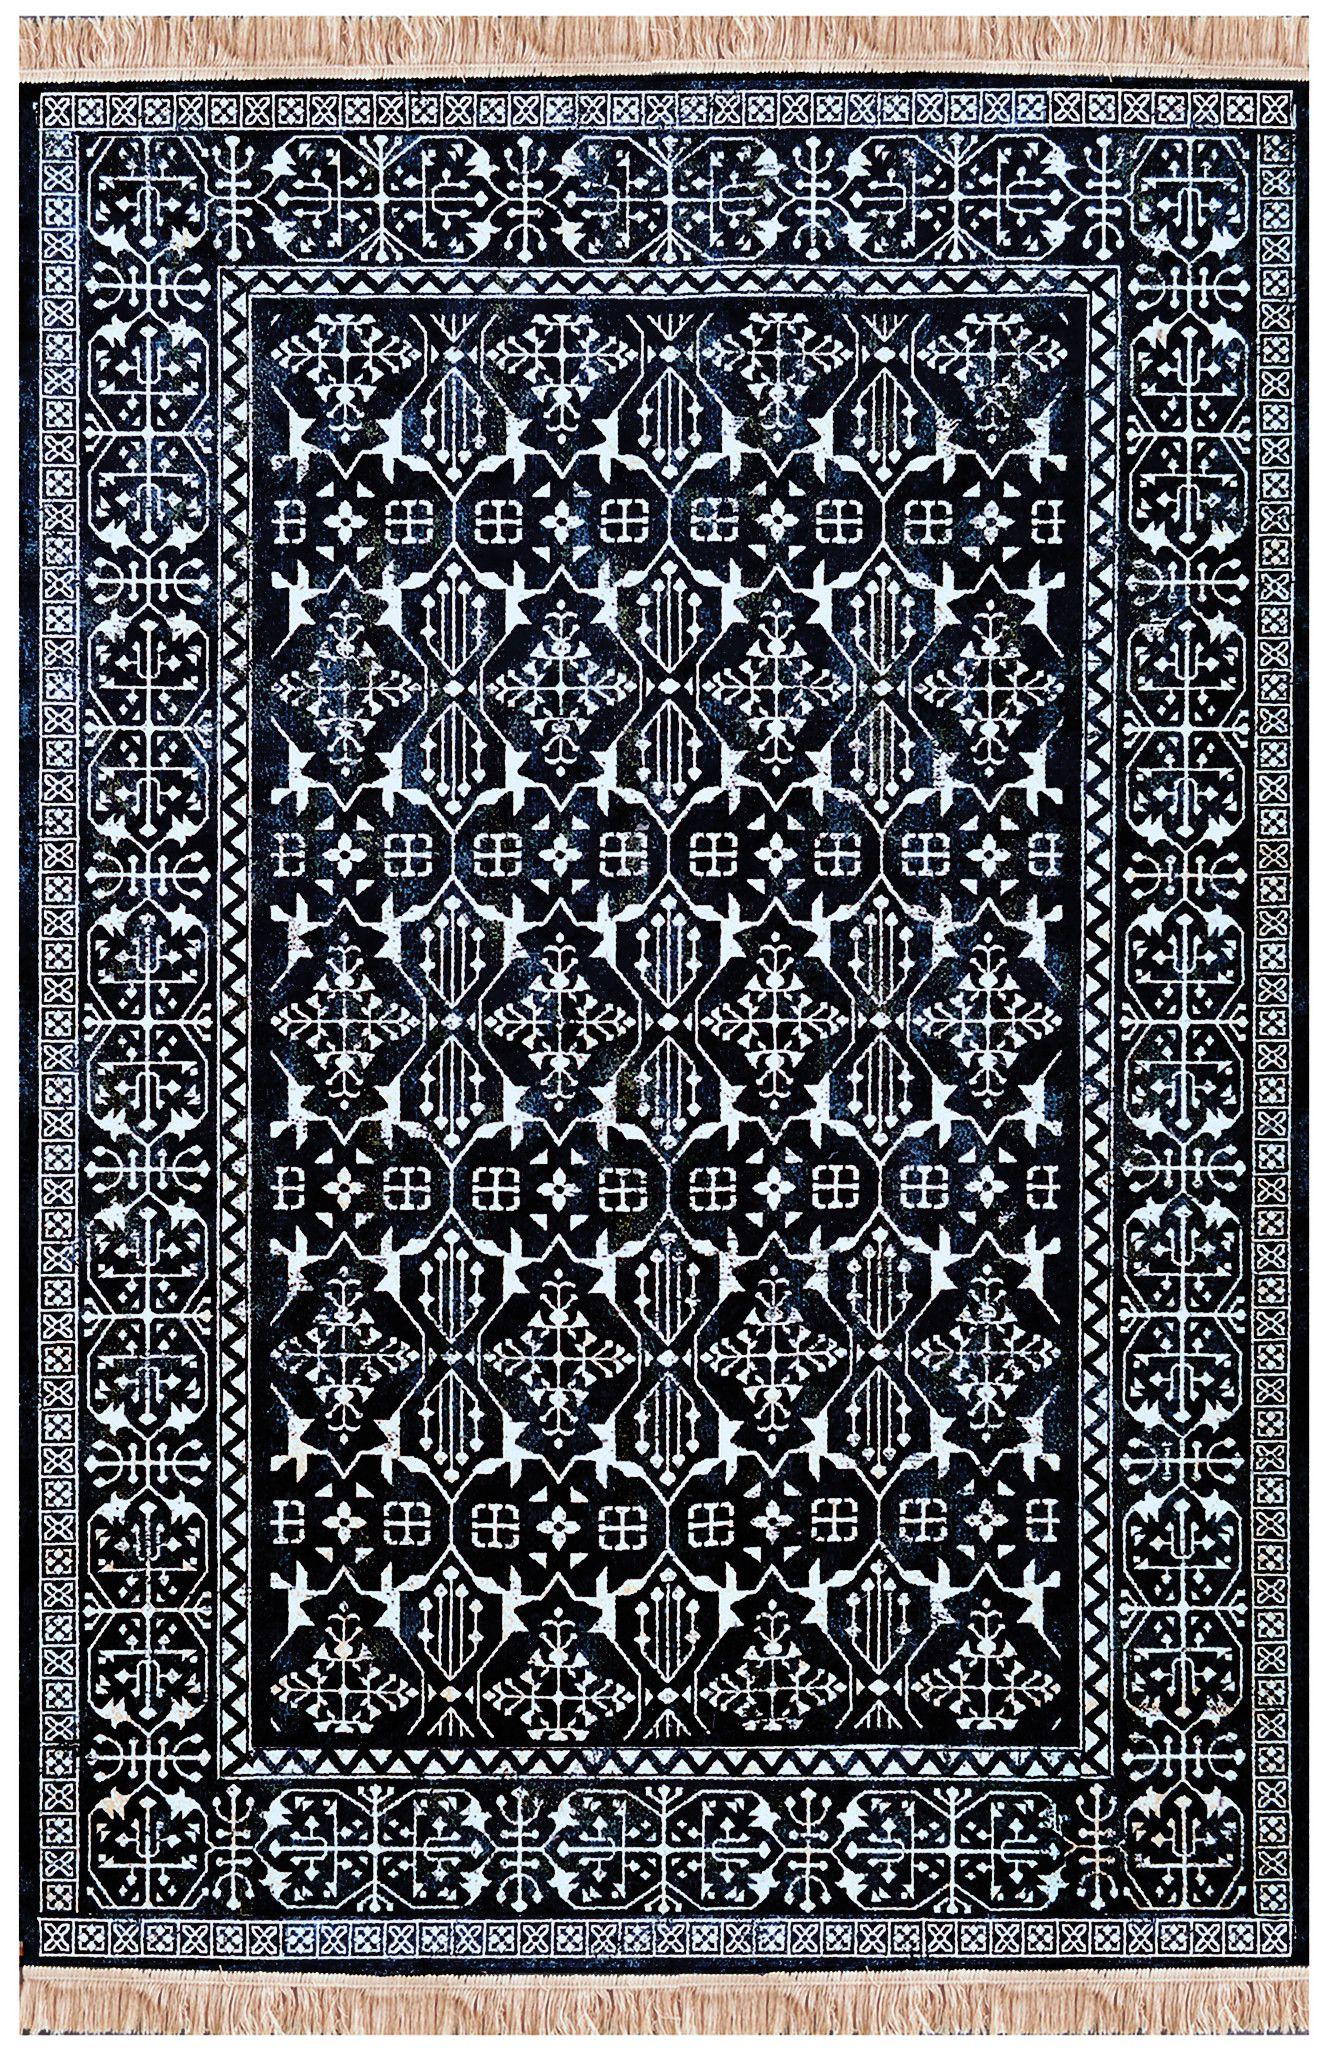 Modern Navy Blue And White Persian Style Fringe Rug Hicks Master